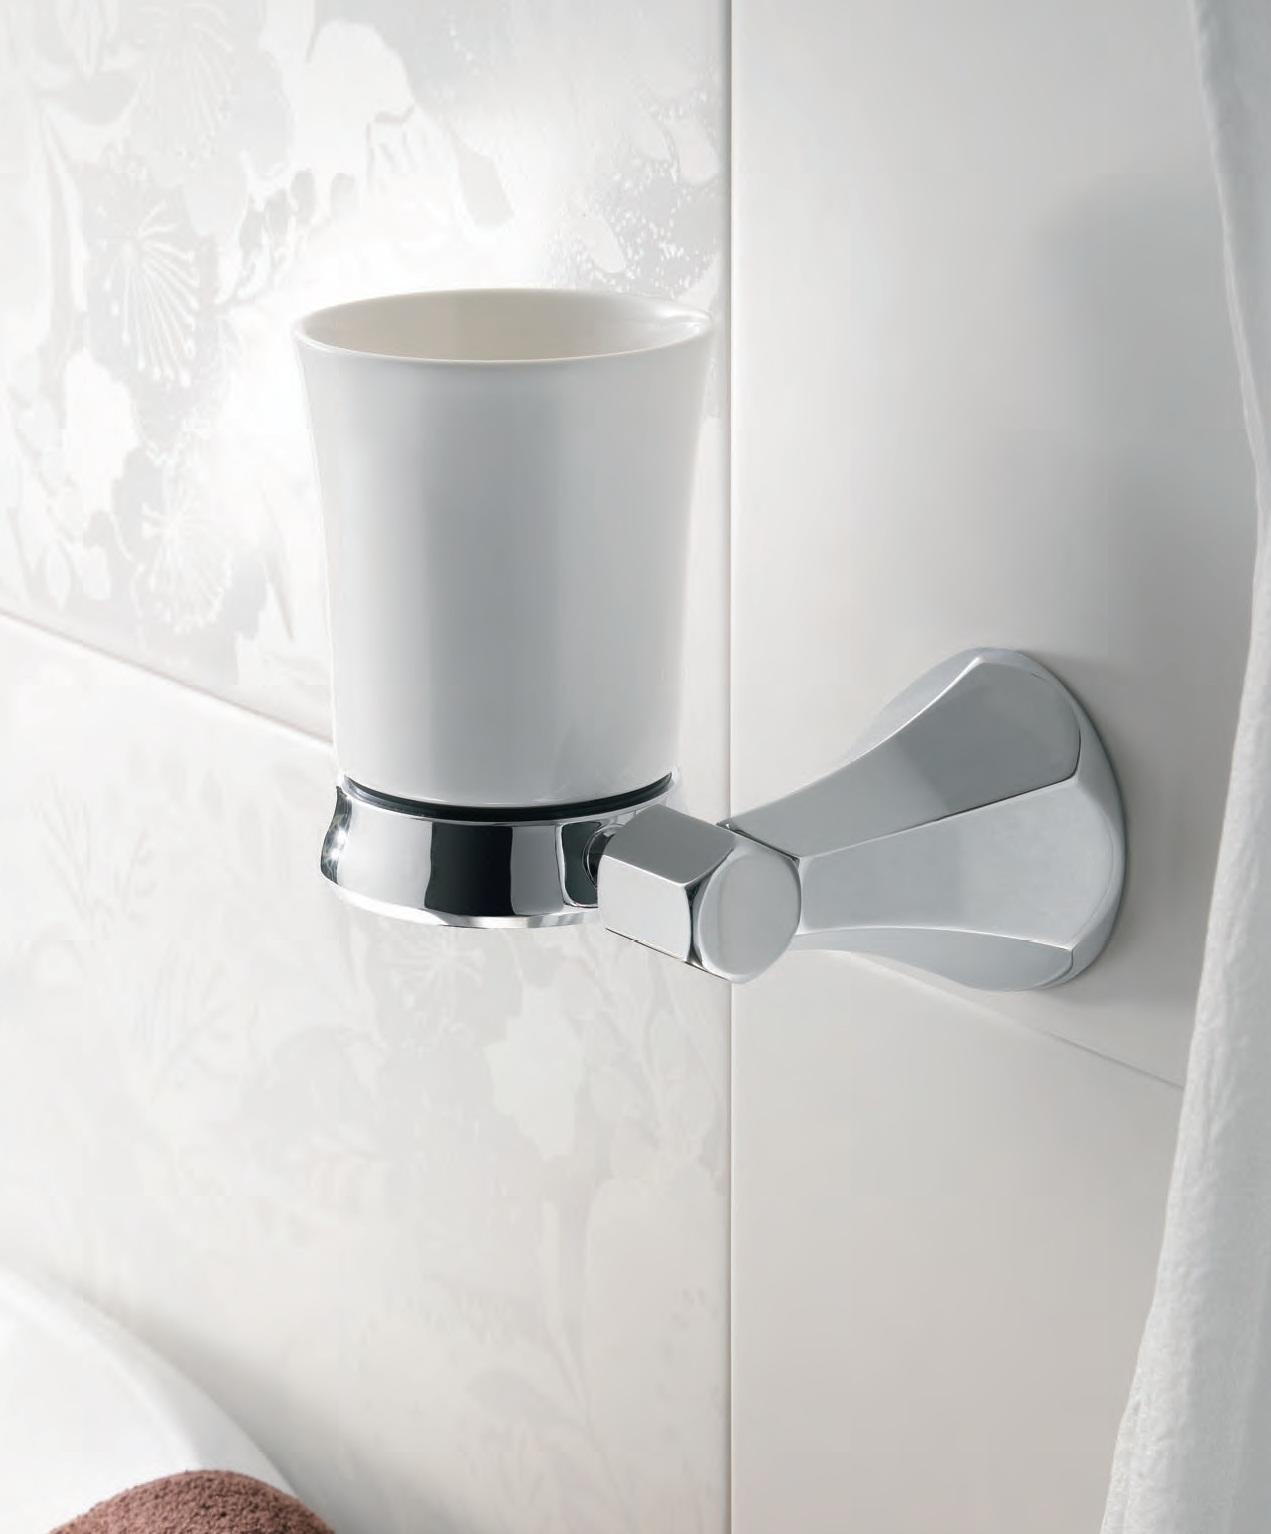 Bathroom Accessory Bathroom Accessory Products Korea